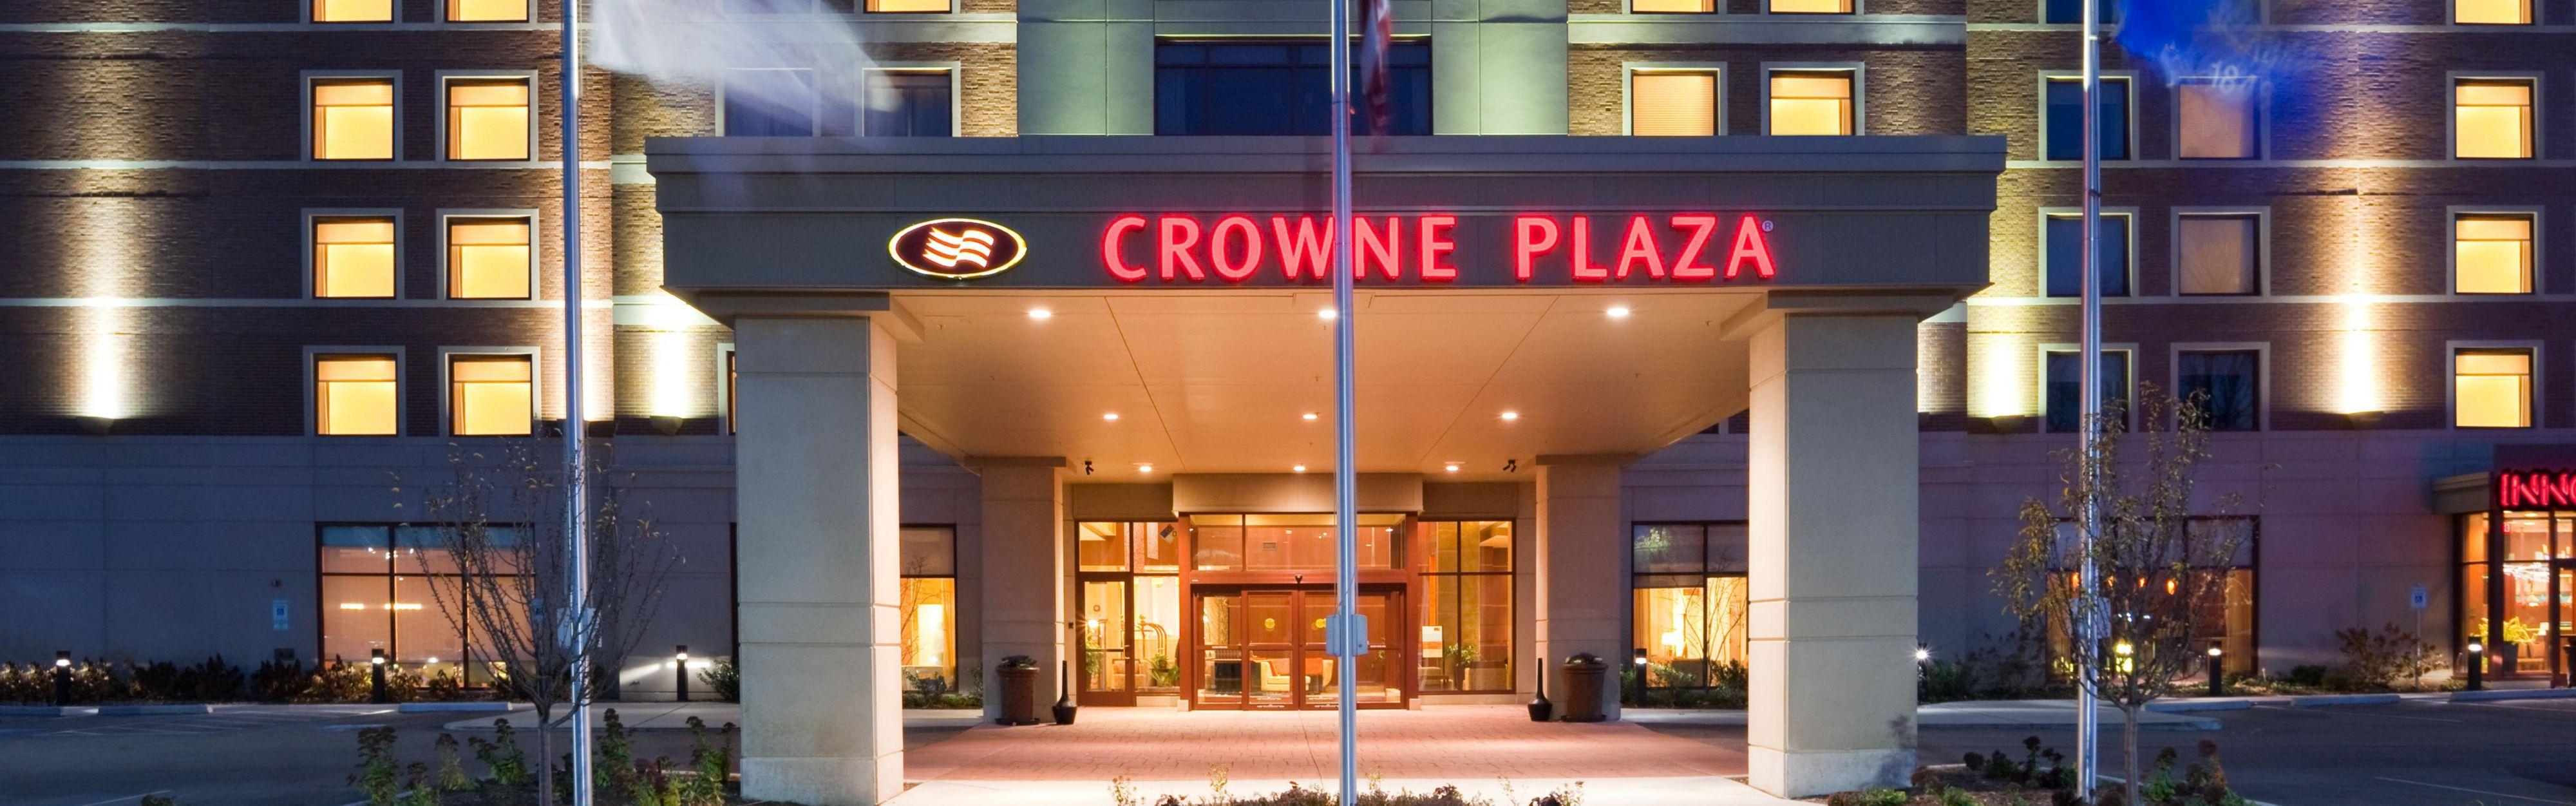 Crowne Plaza Milwaukee West image 0